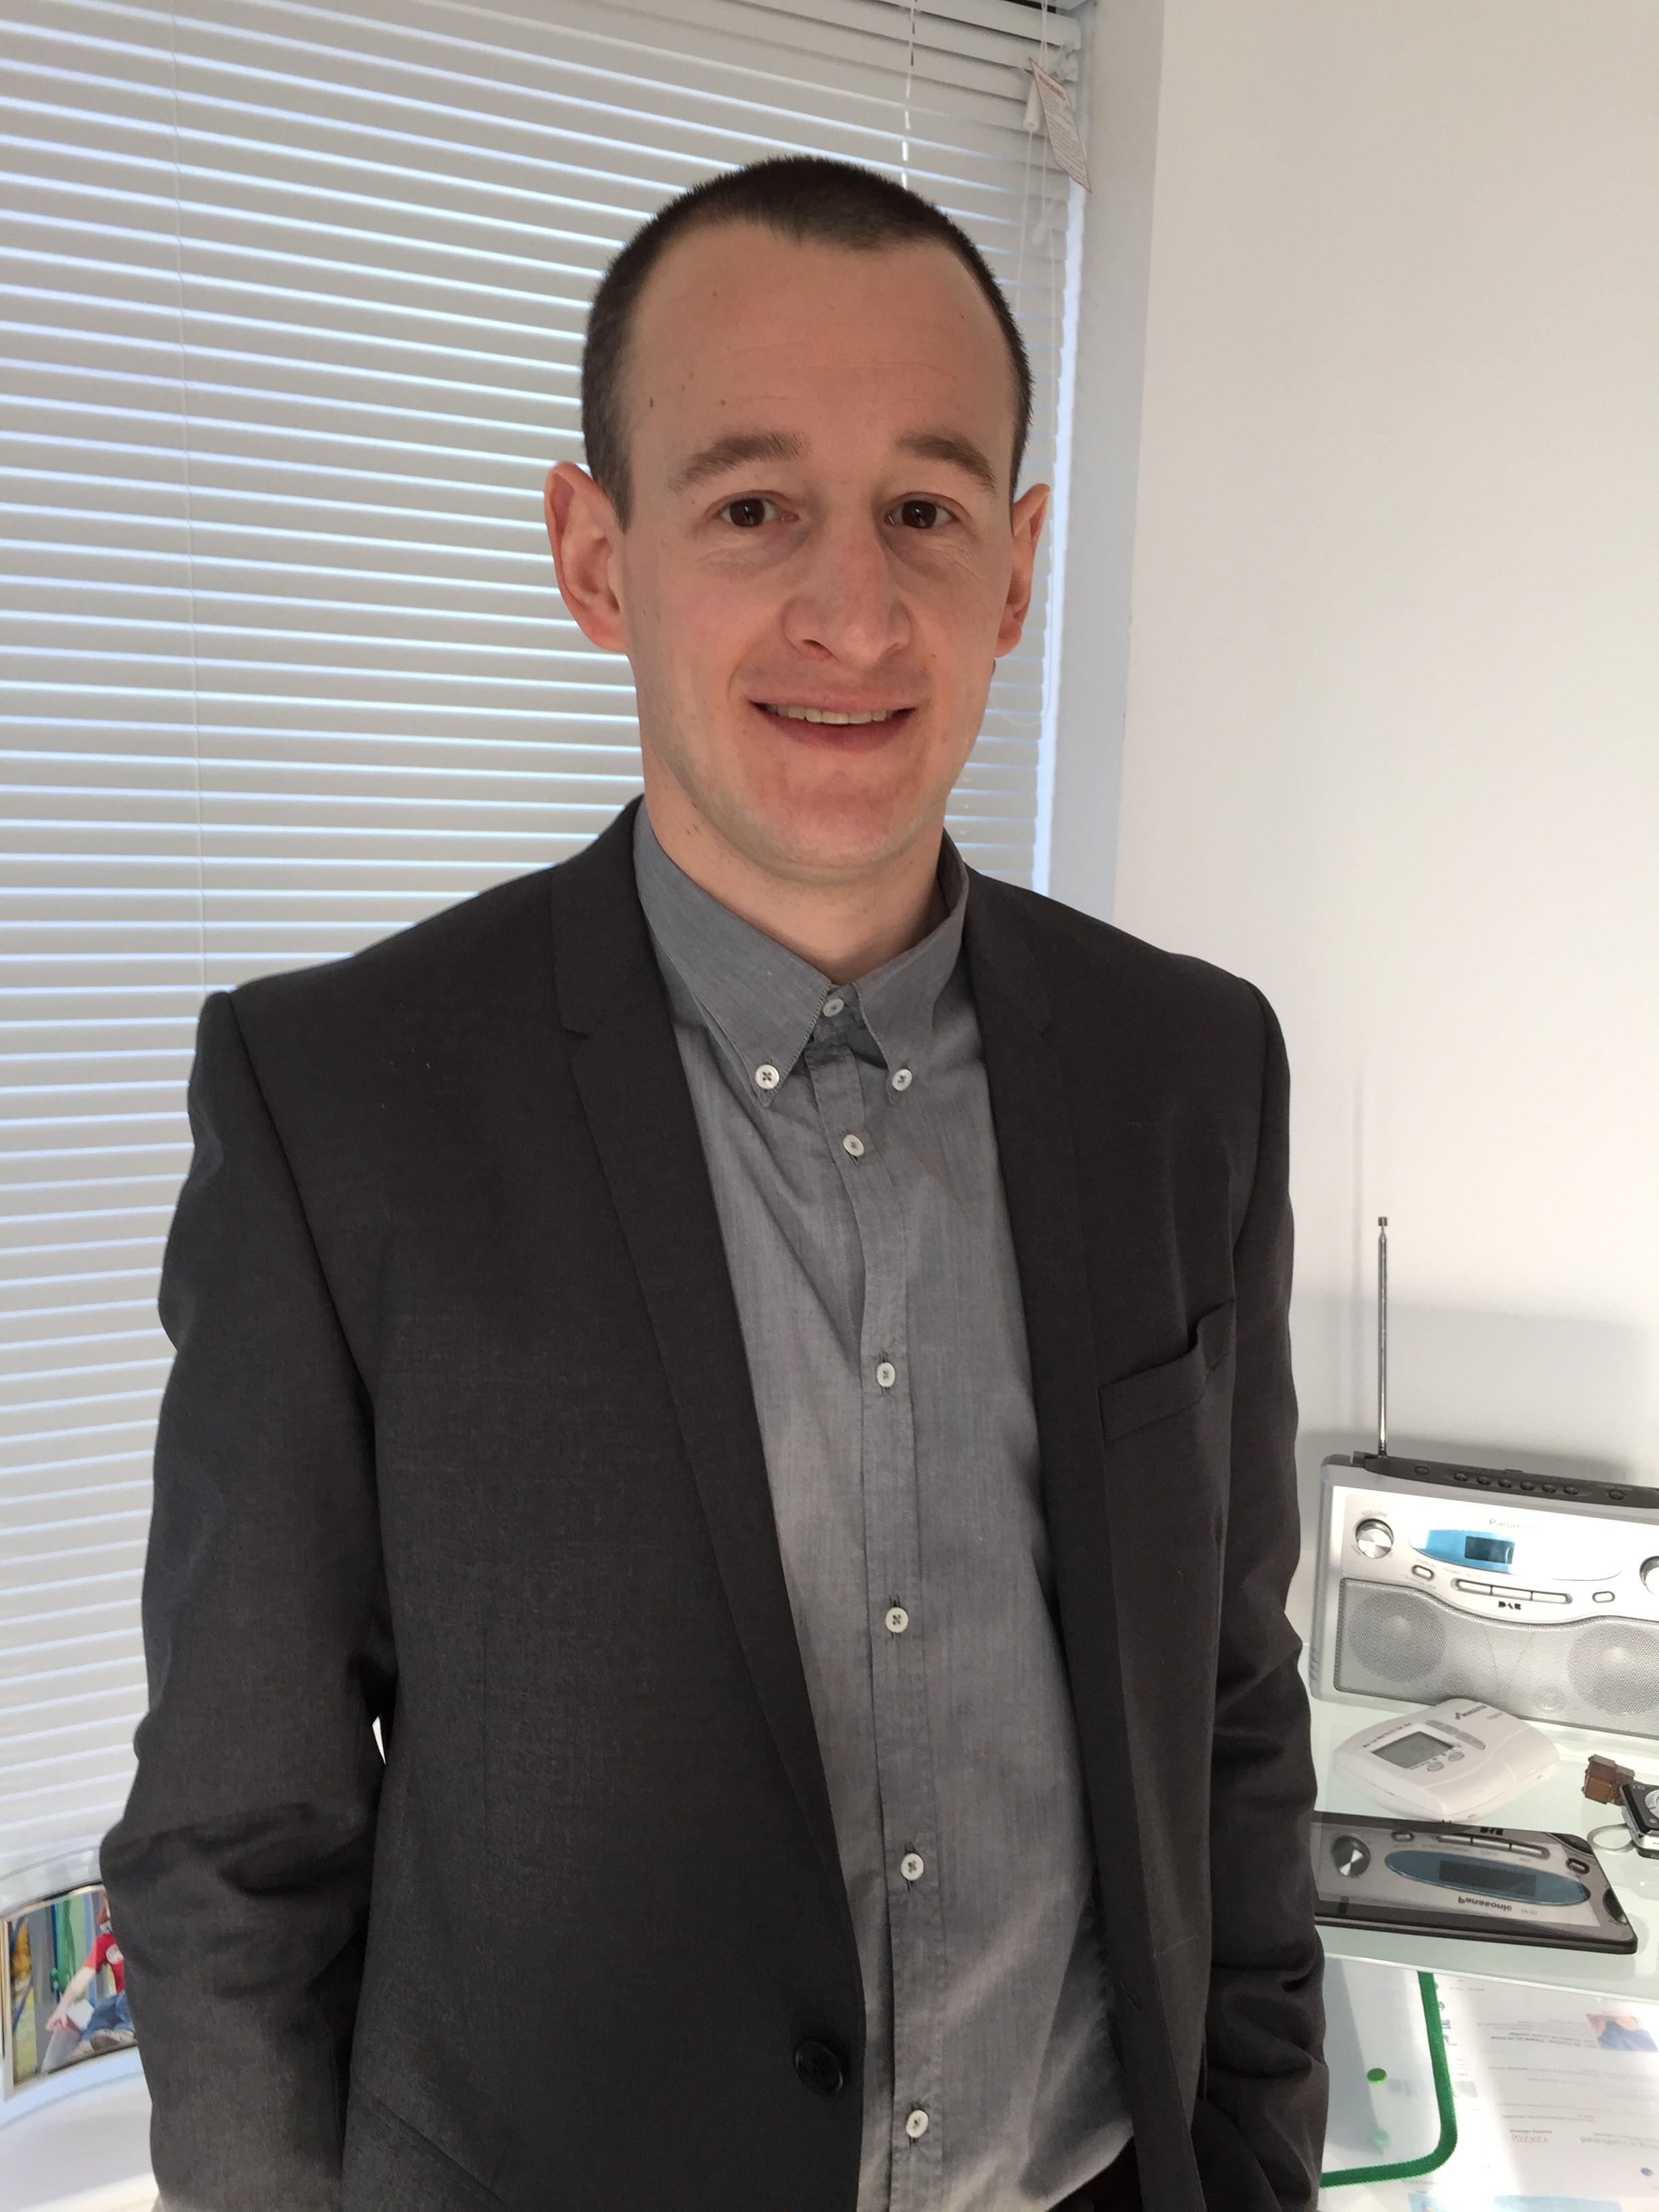 Mark Rushton, STC Global's managing director.